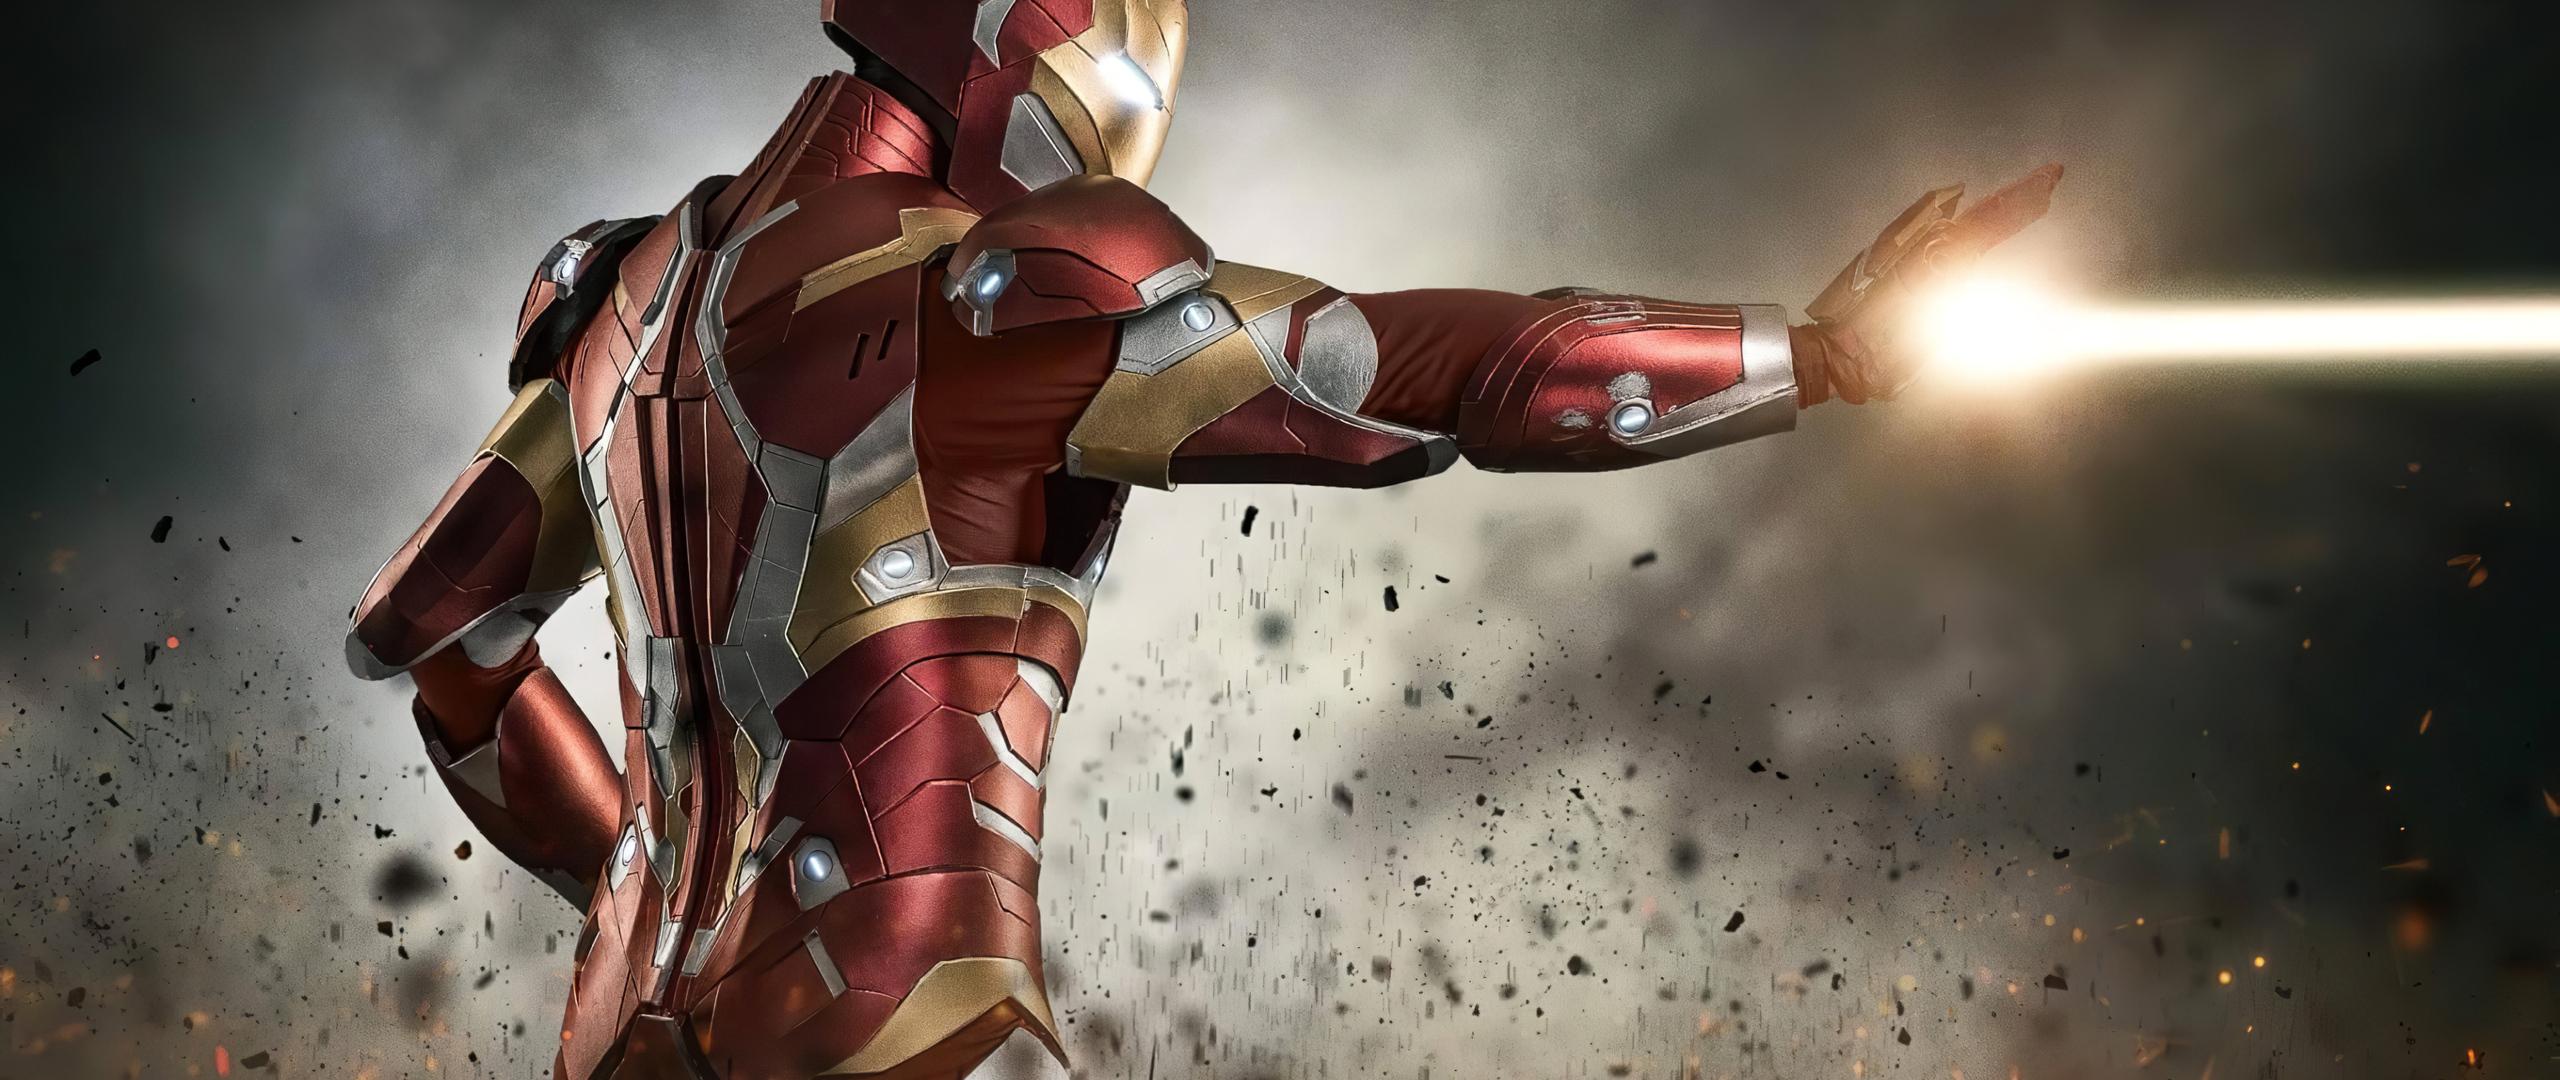 cosplay-iron-man-4k-ke.jpg